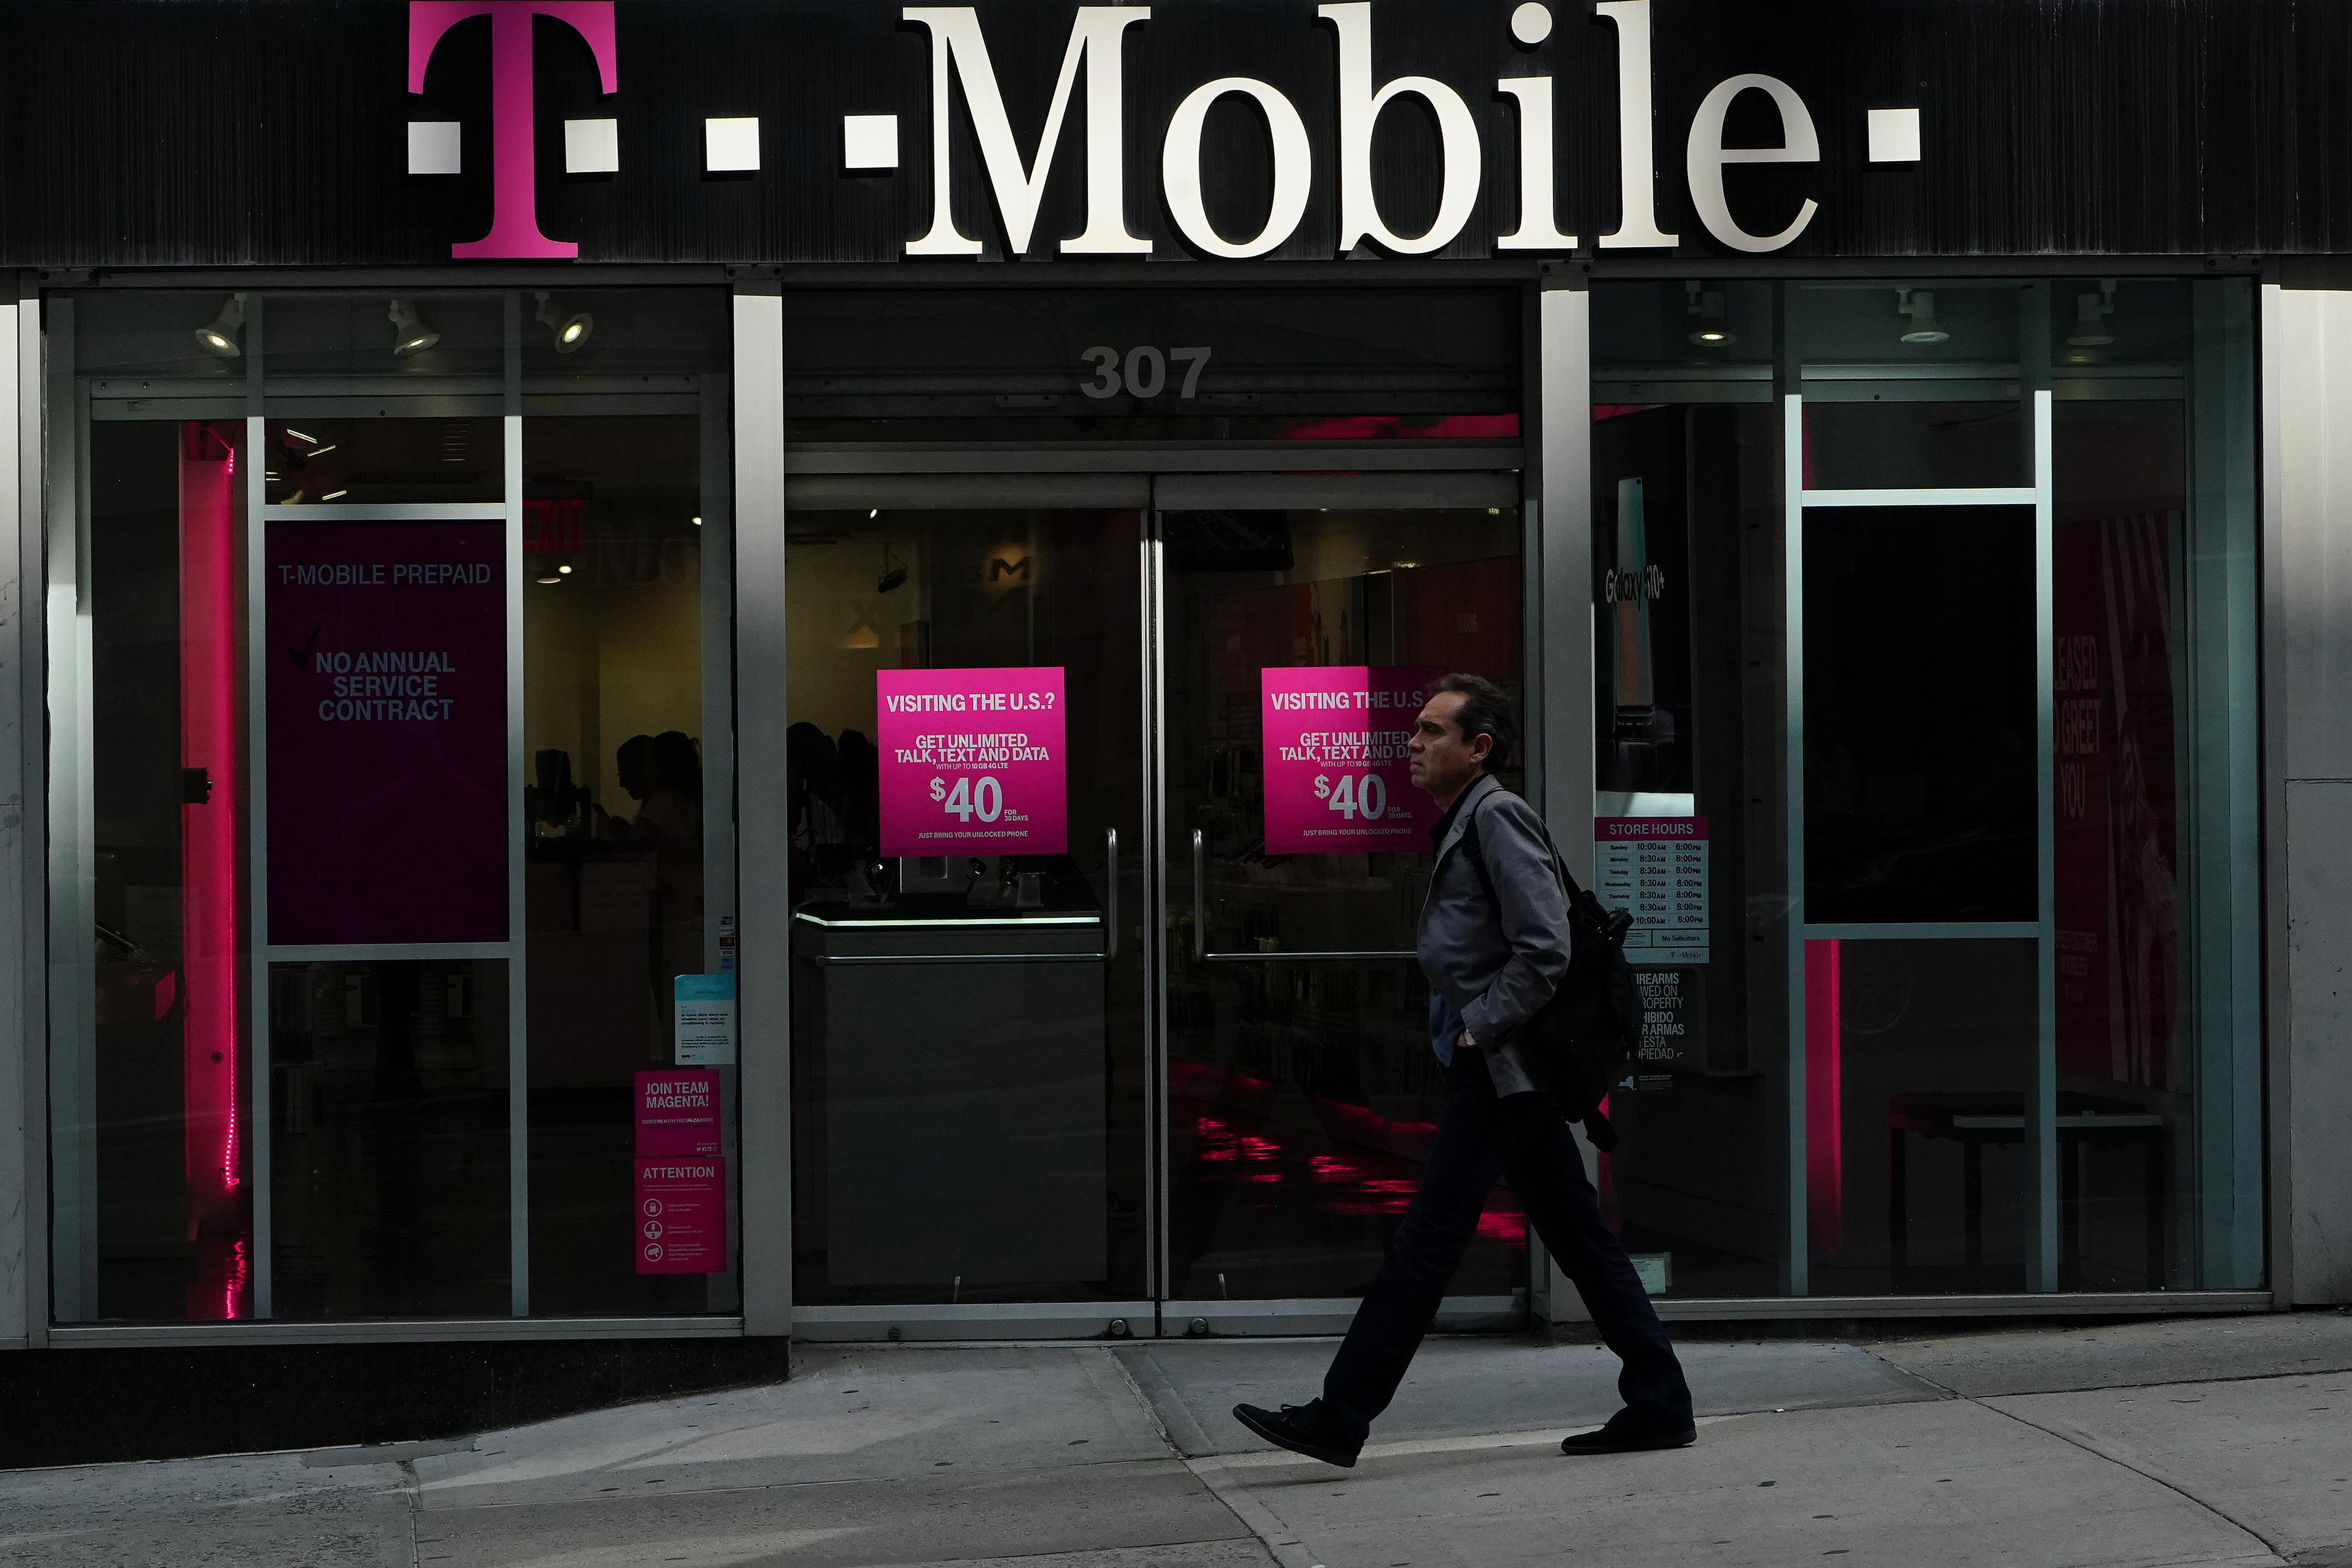 A T-Mobile store in the Manhattan borough of New York, U.S. REUTERS/Carlo Allegri